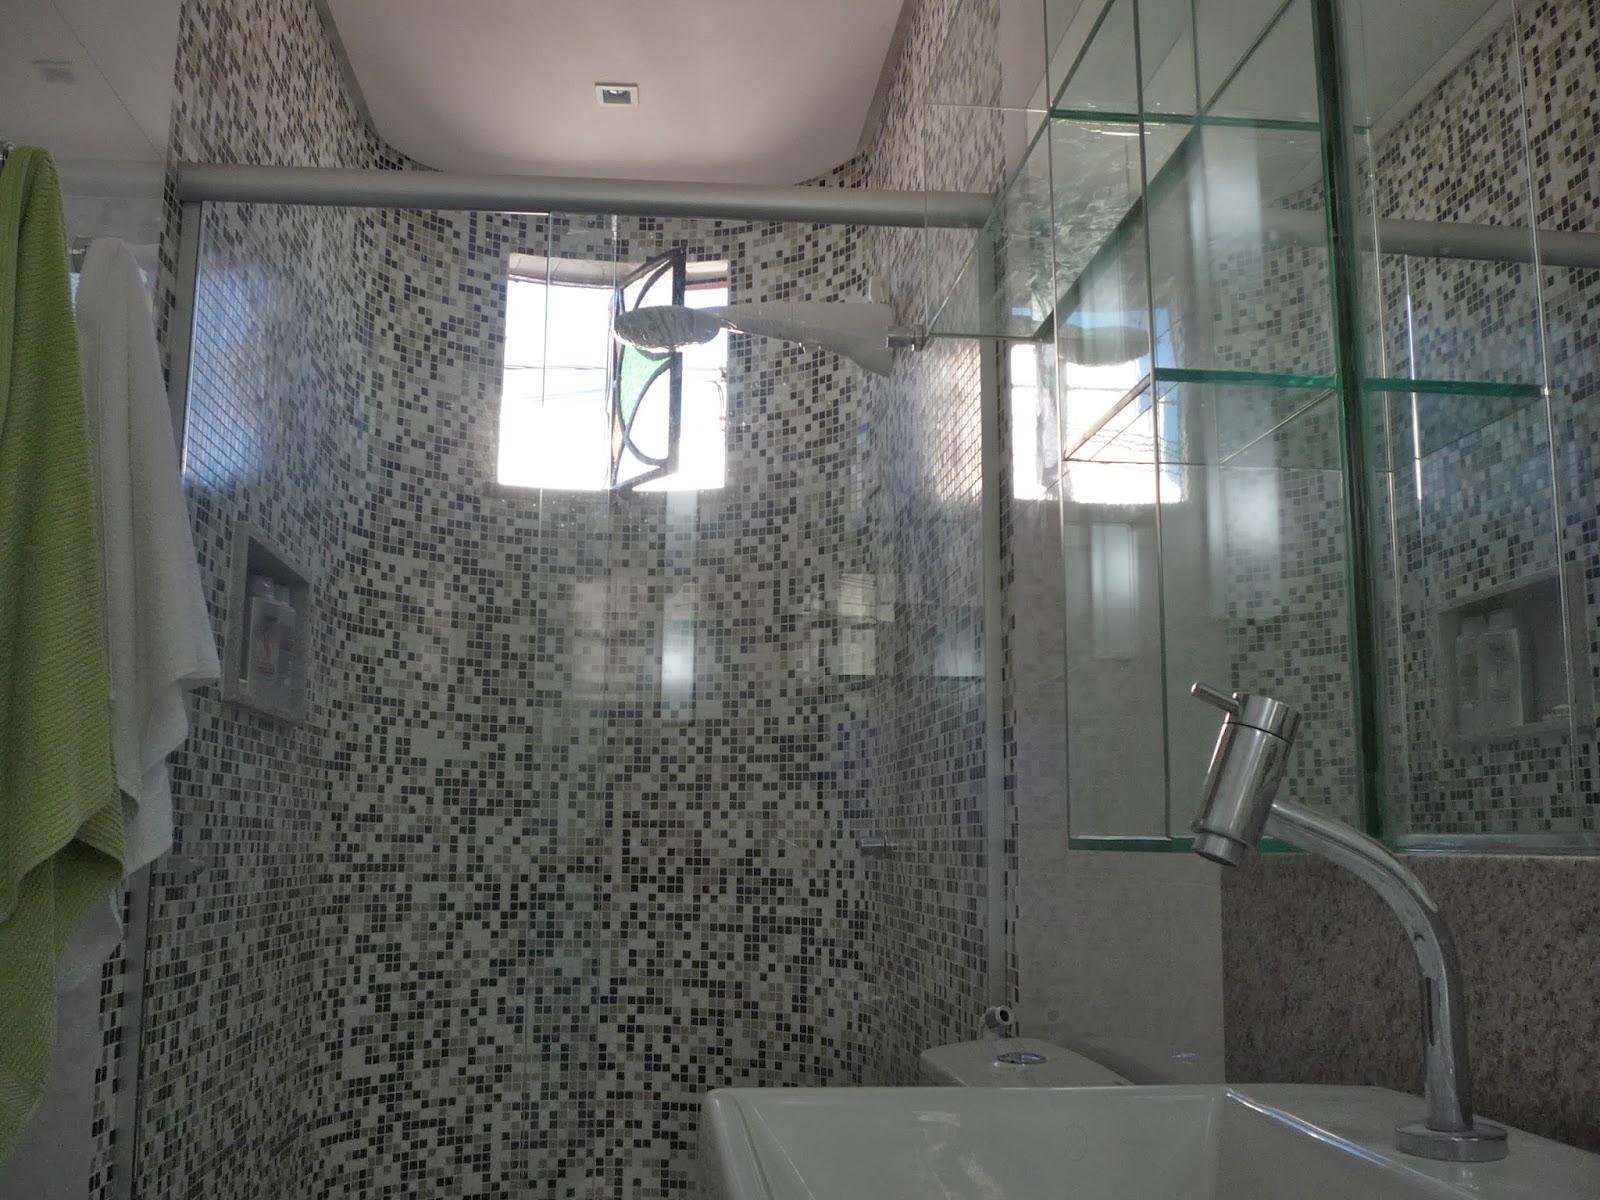 Arquitetura & Interiores: JOGO DE CORES: PRETO   CINZA   BRANCO #4F617C 1600 1200